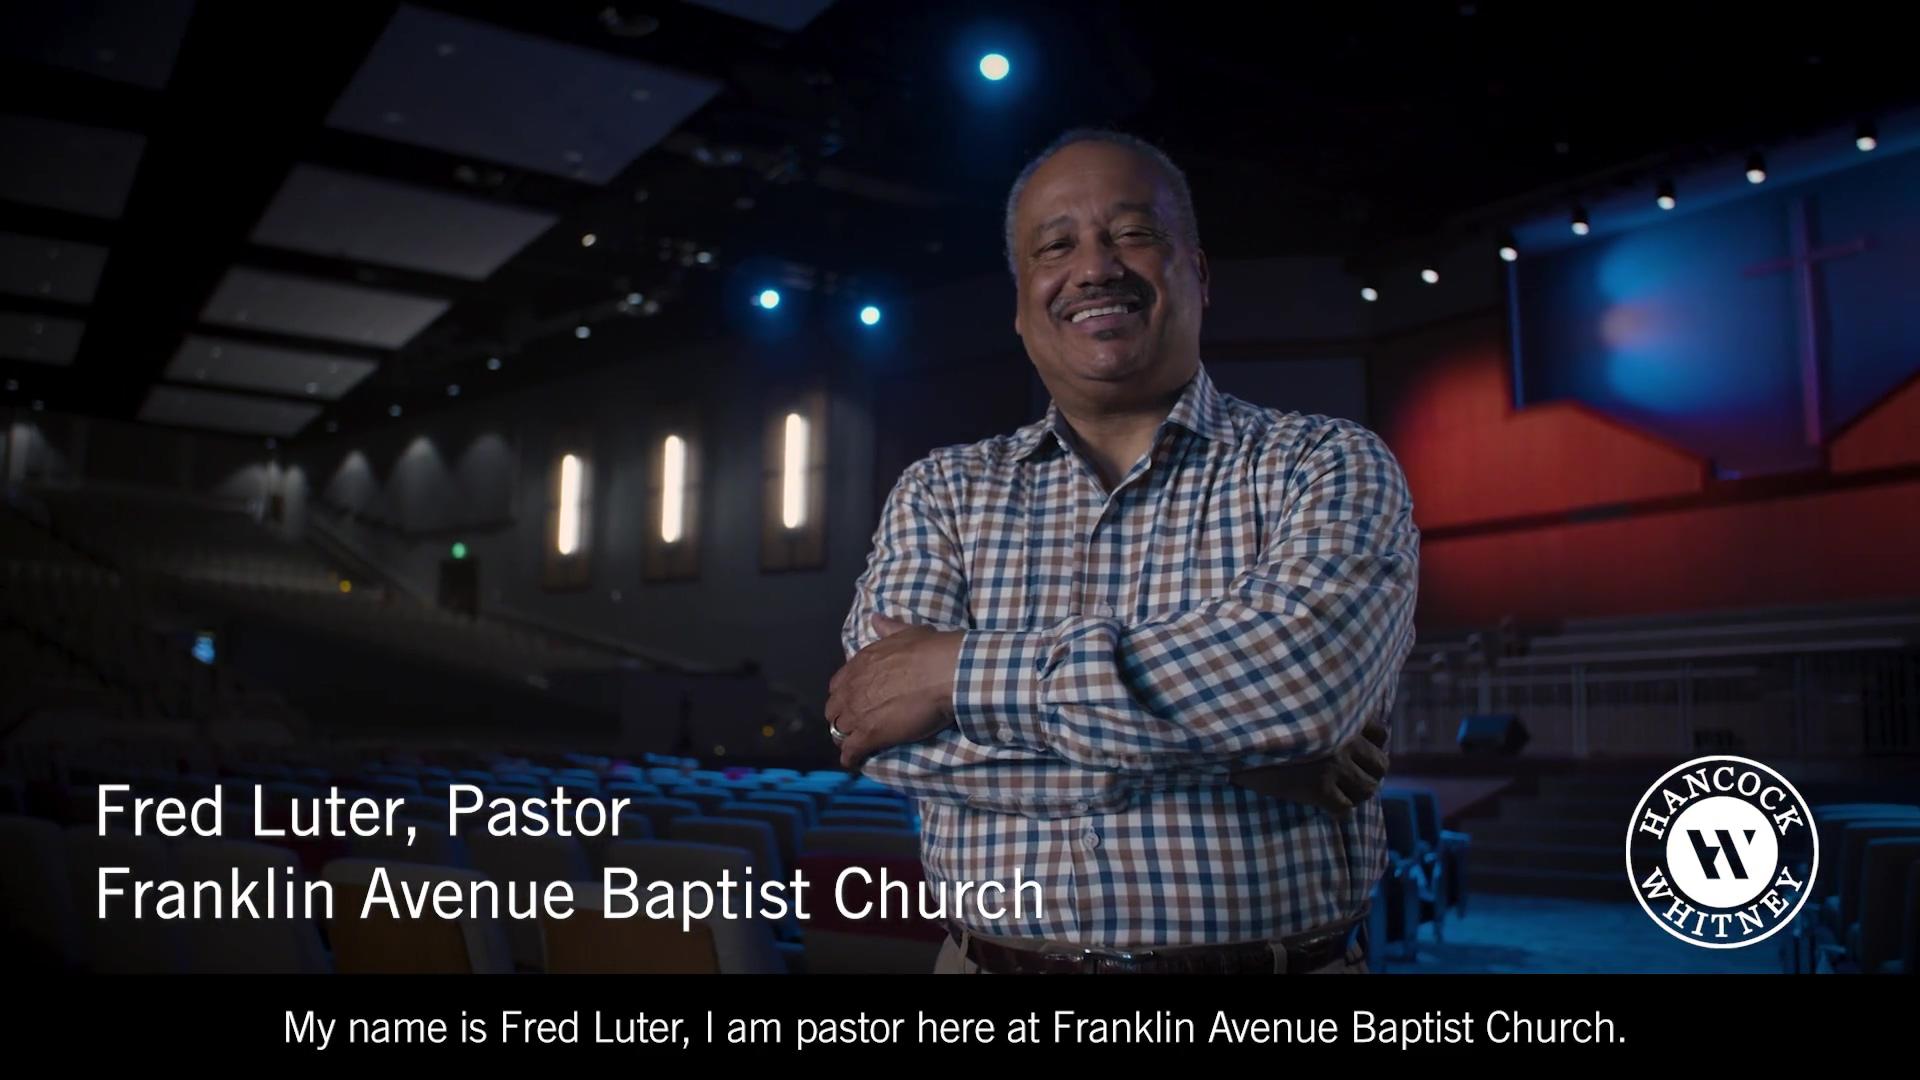 PPP-Franklin-Ave-Baptist-Church-Subtitles-MP4